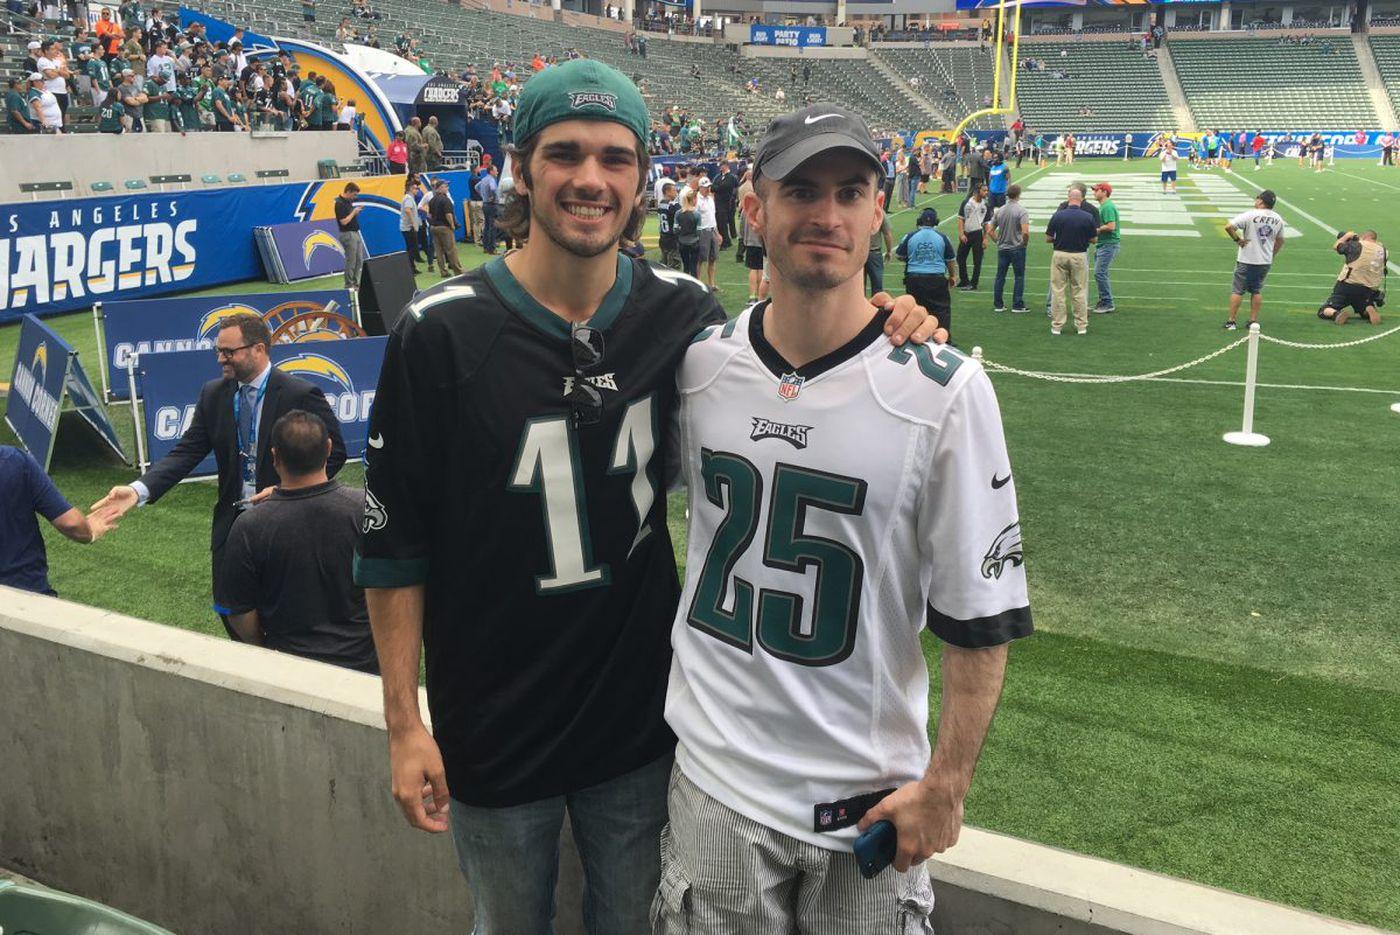 Eagles fans offer kidneys, naming rights for Super Bowl tickets | Helen Ubiñas